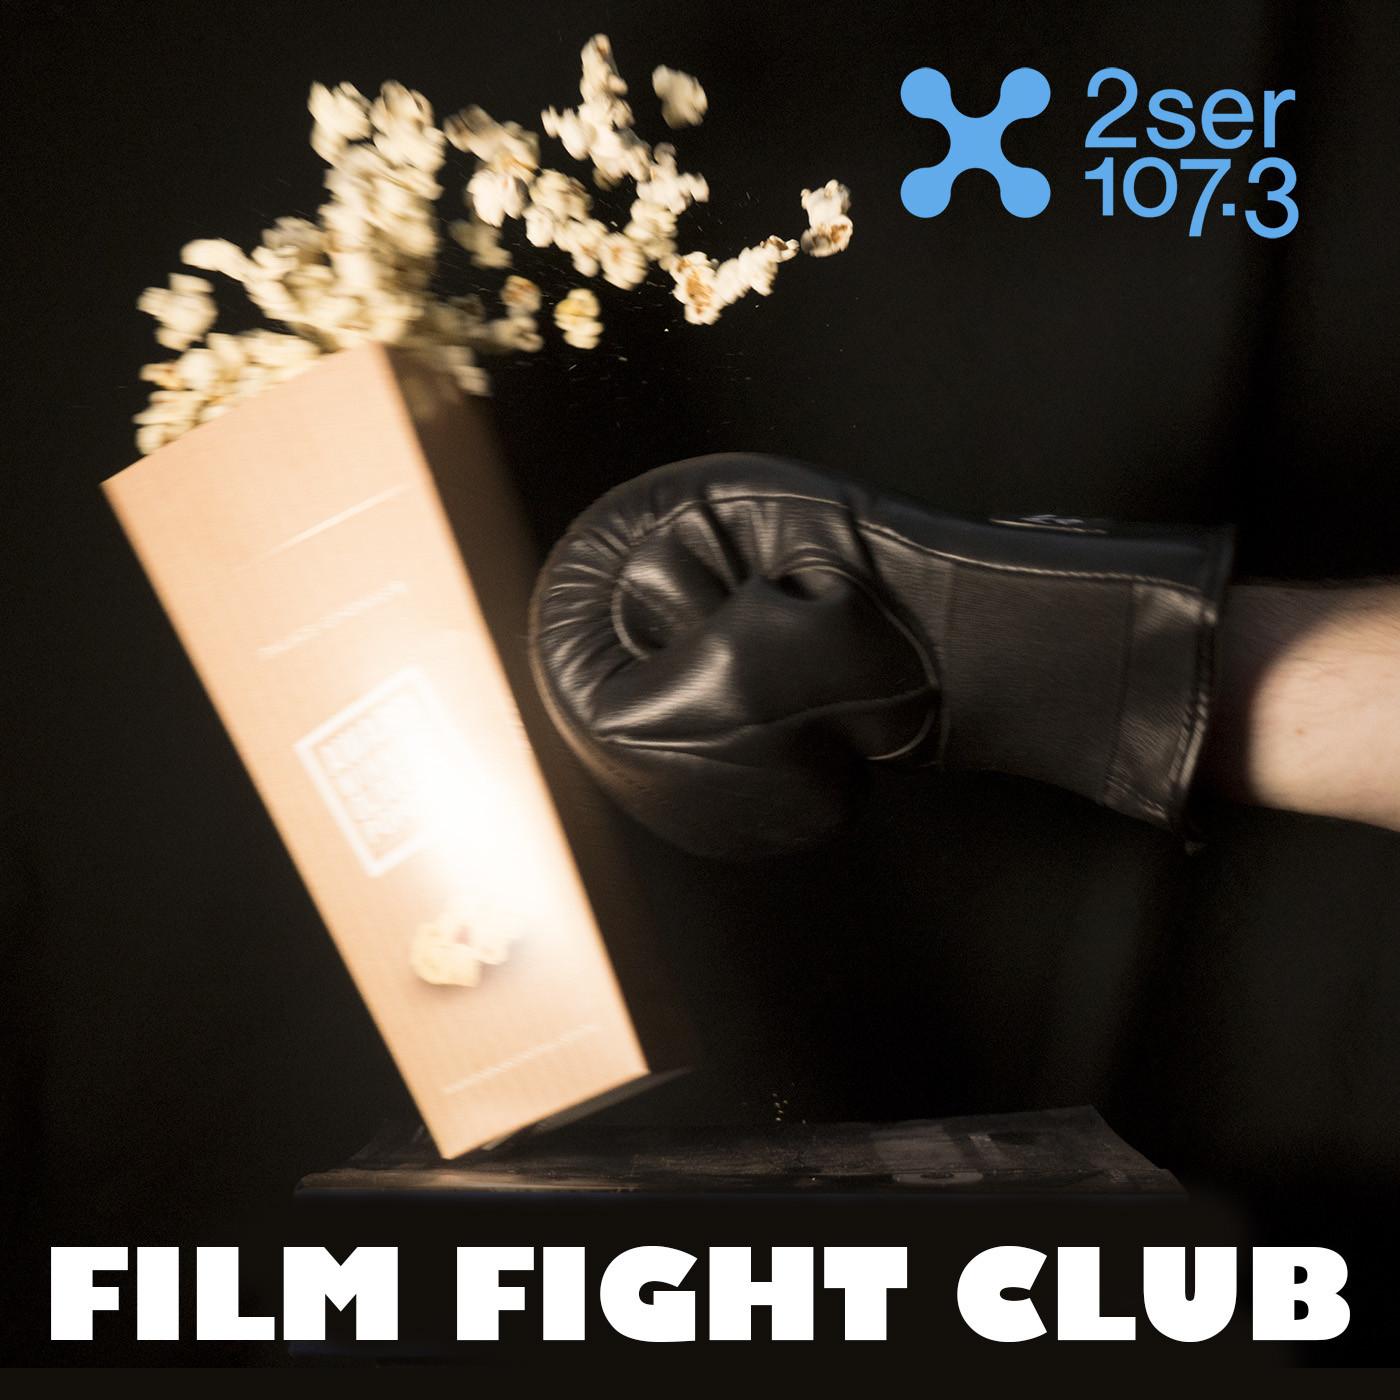 Film Fight Club